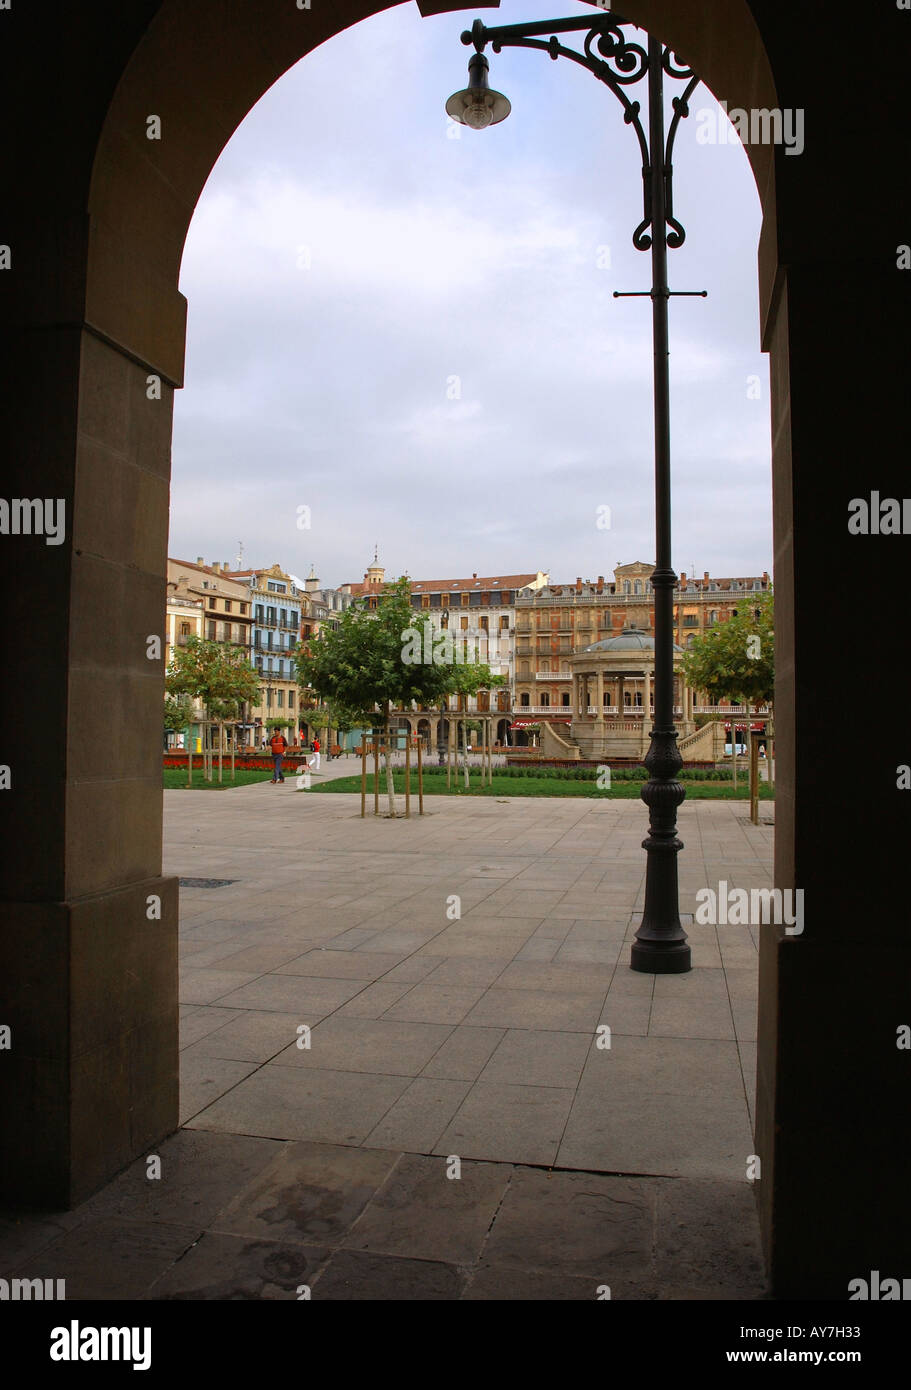 Characteristic Colourful Square from Arch Pamplona Iruñea Iruña Navarra Navarre Spain Iberia España Europe Stock Photo